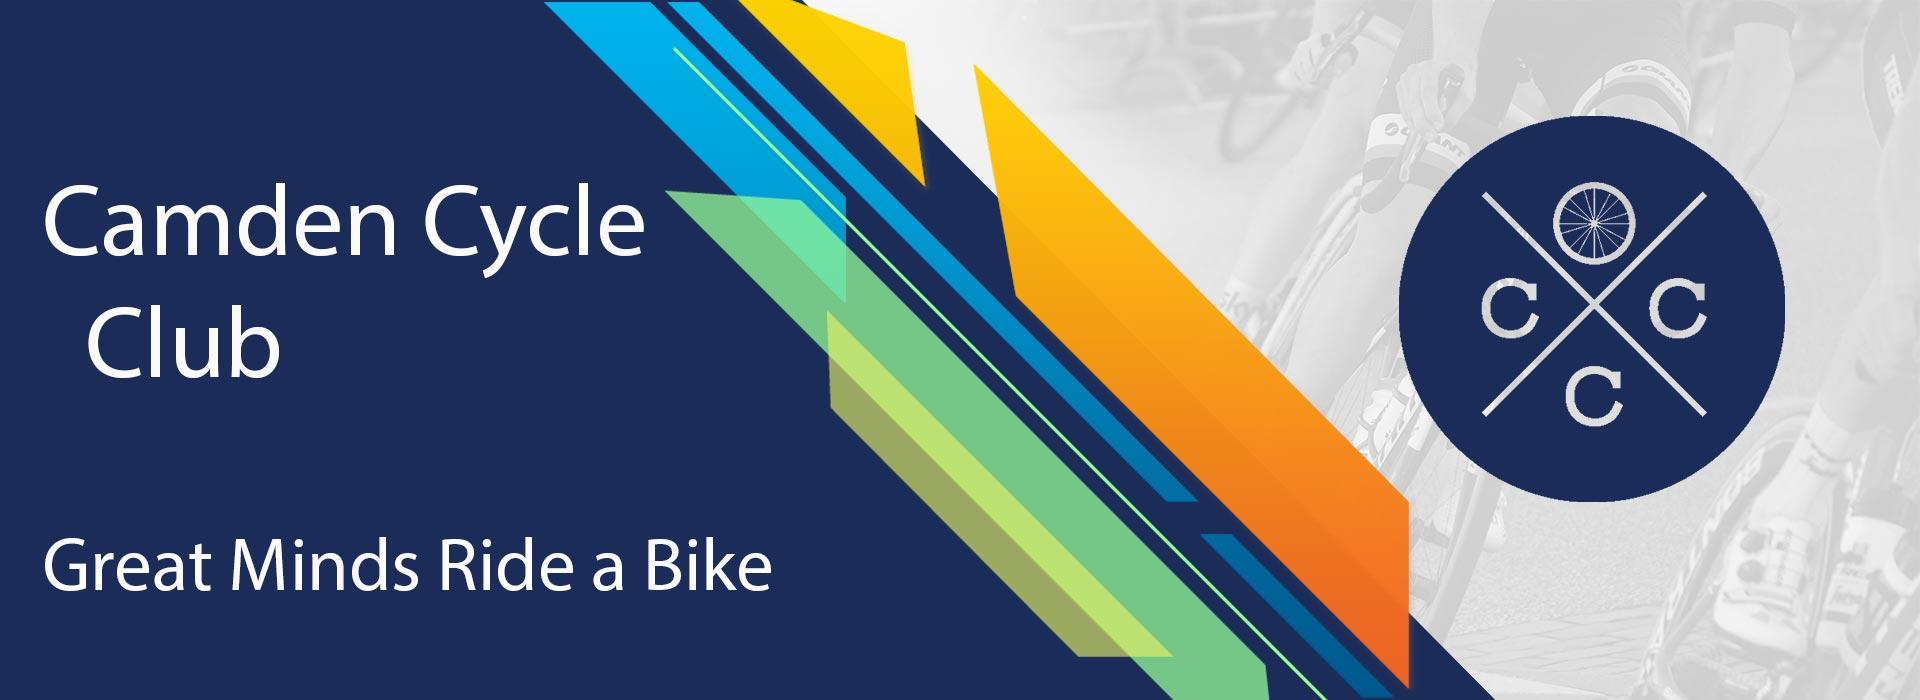 Camden Cycle Club Banner